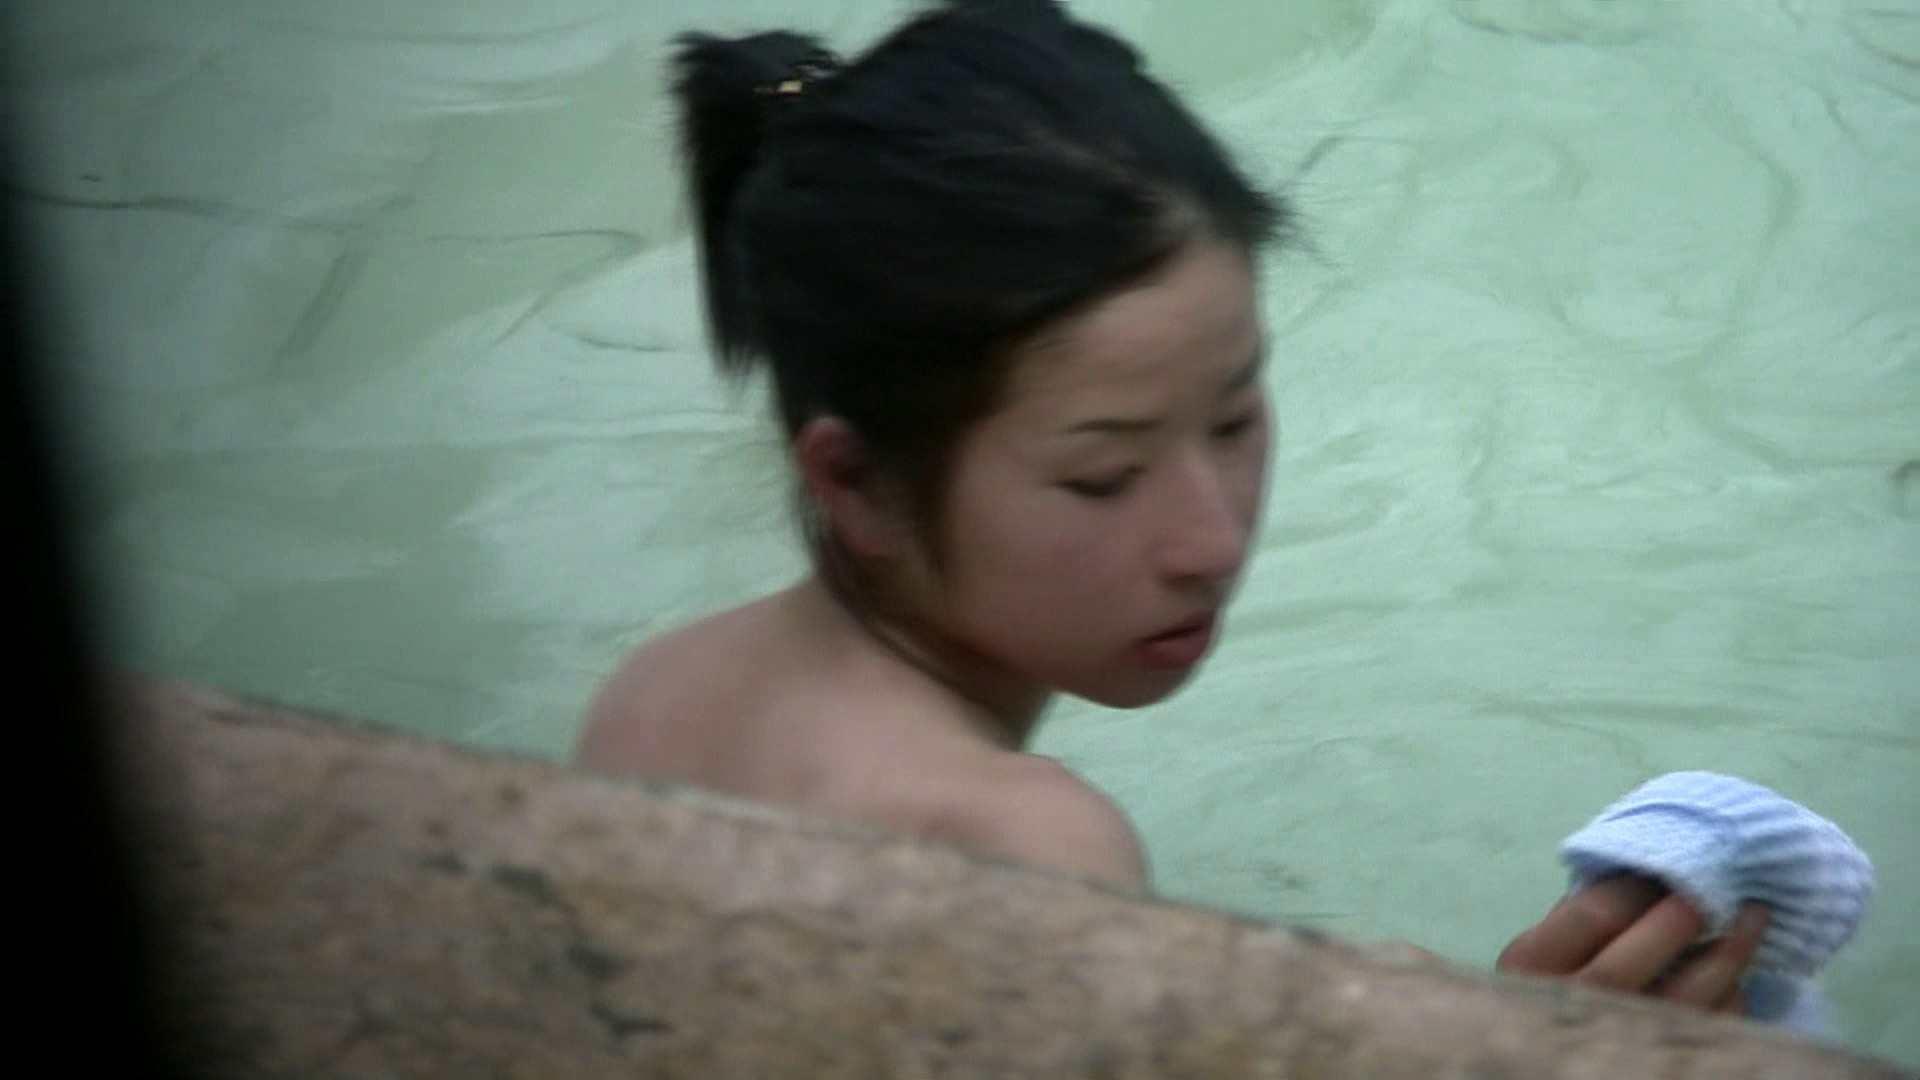 Aquaな露天風呂Vol.656 露天風呂編  91PIX 2